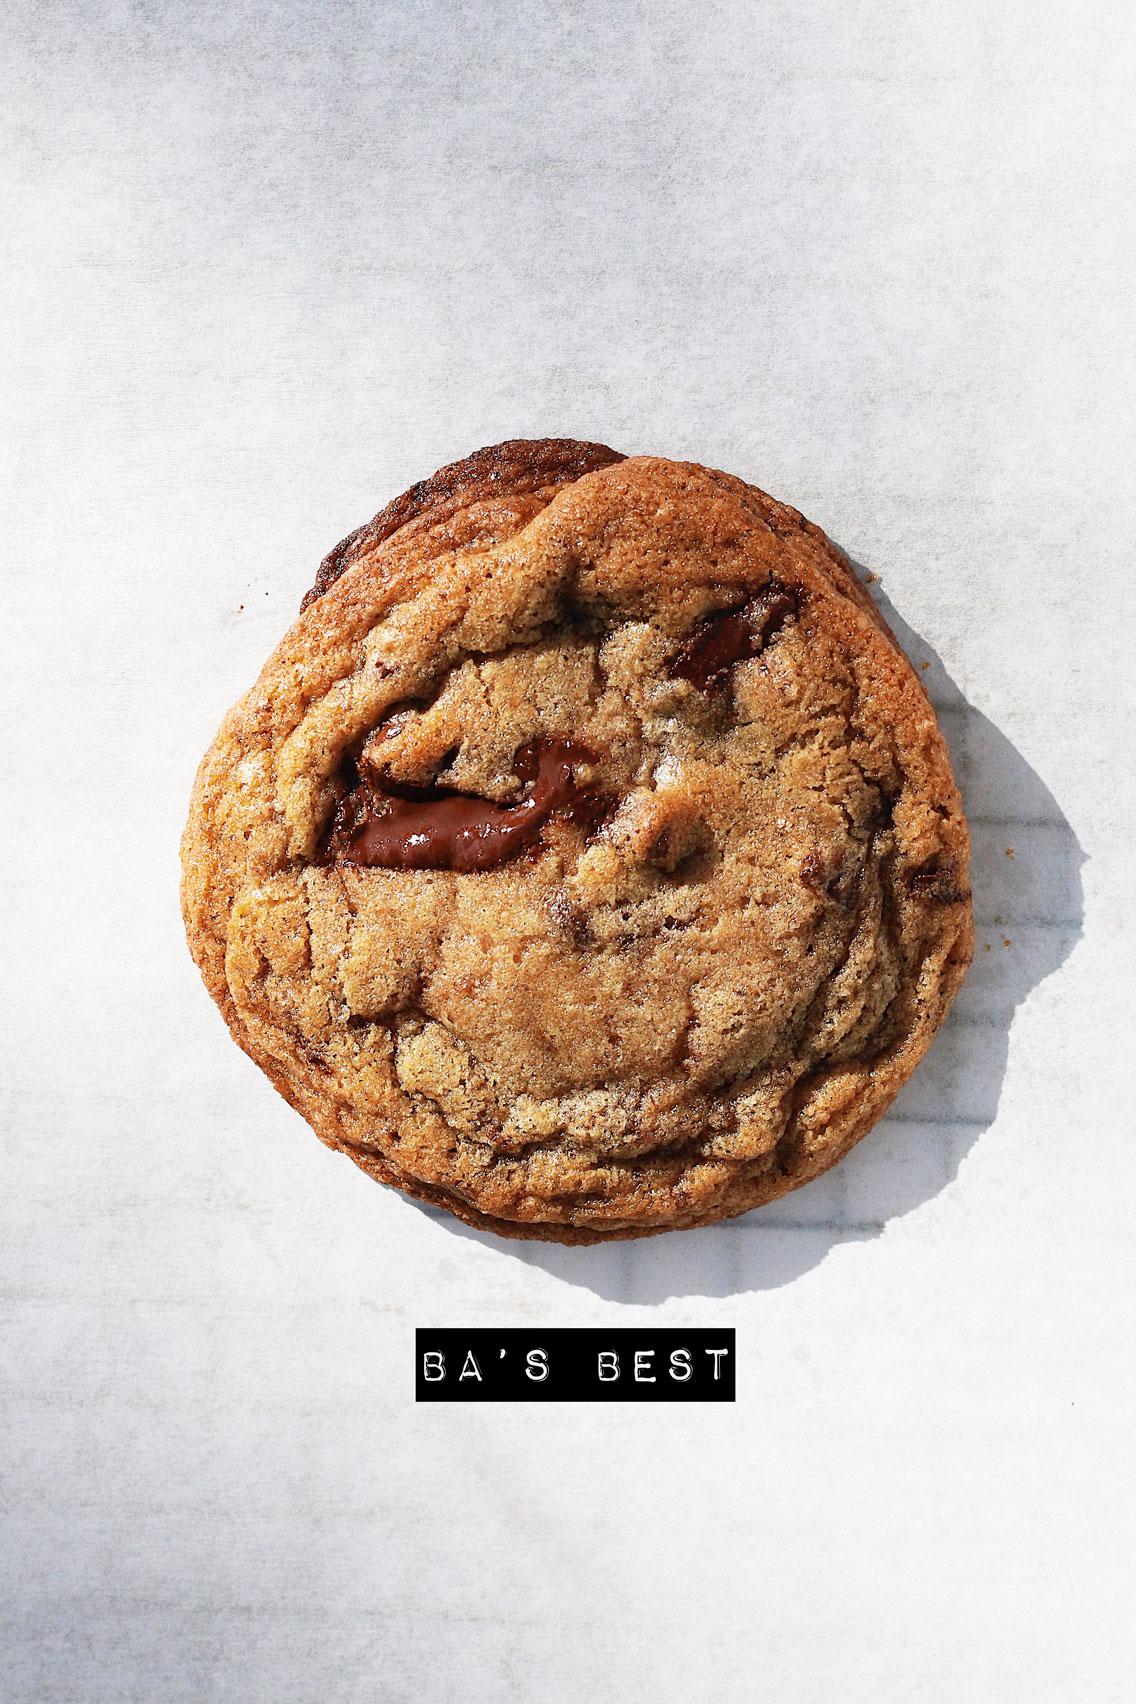 herbakinglab-best-chocolate-chip-cookie-bake-off-ba's-best